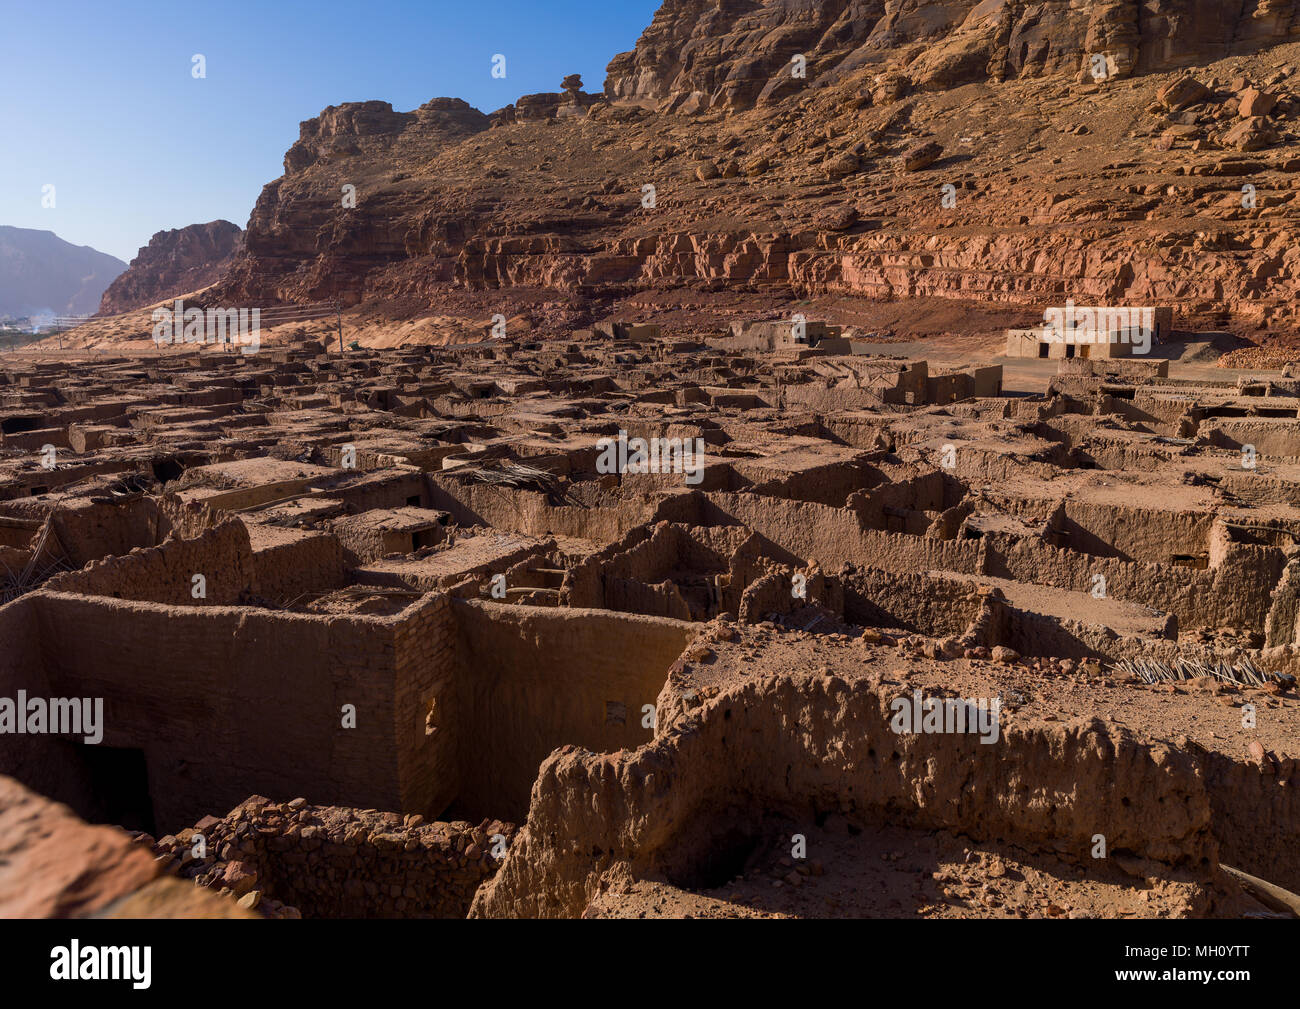 Al-ula old town with adobe houses, Al Madinah Province, Al-Ula, Saudi Arabia - Stock Image